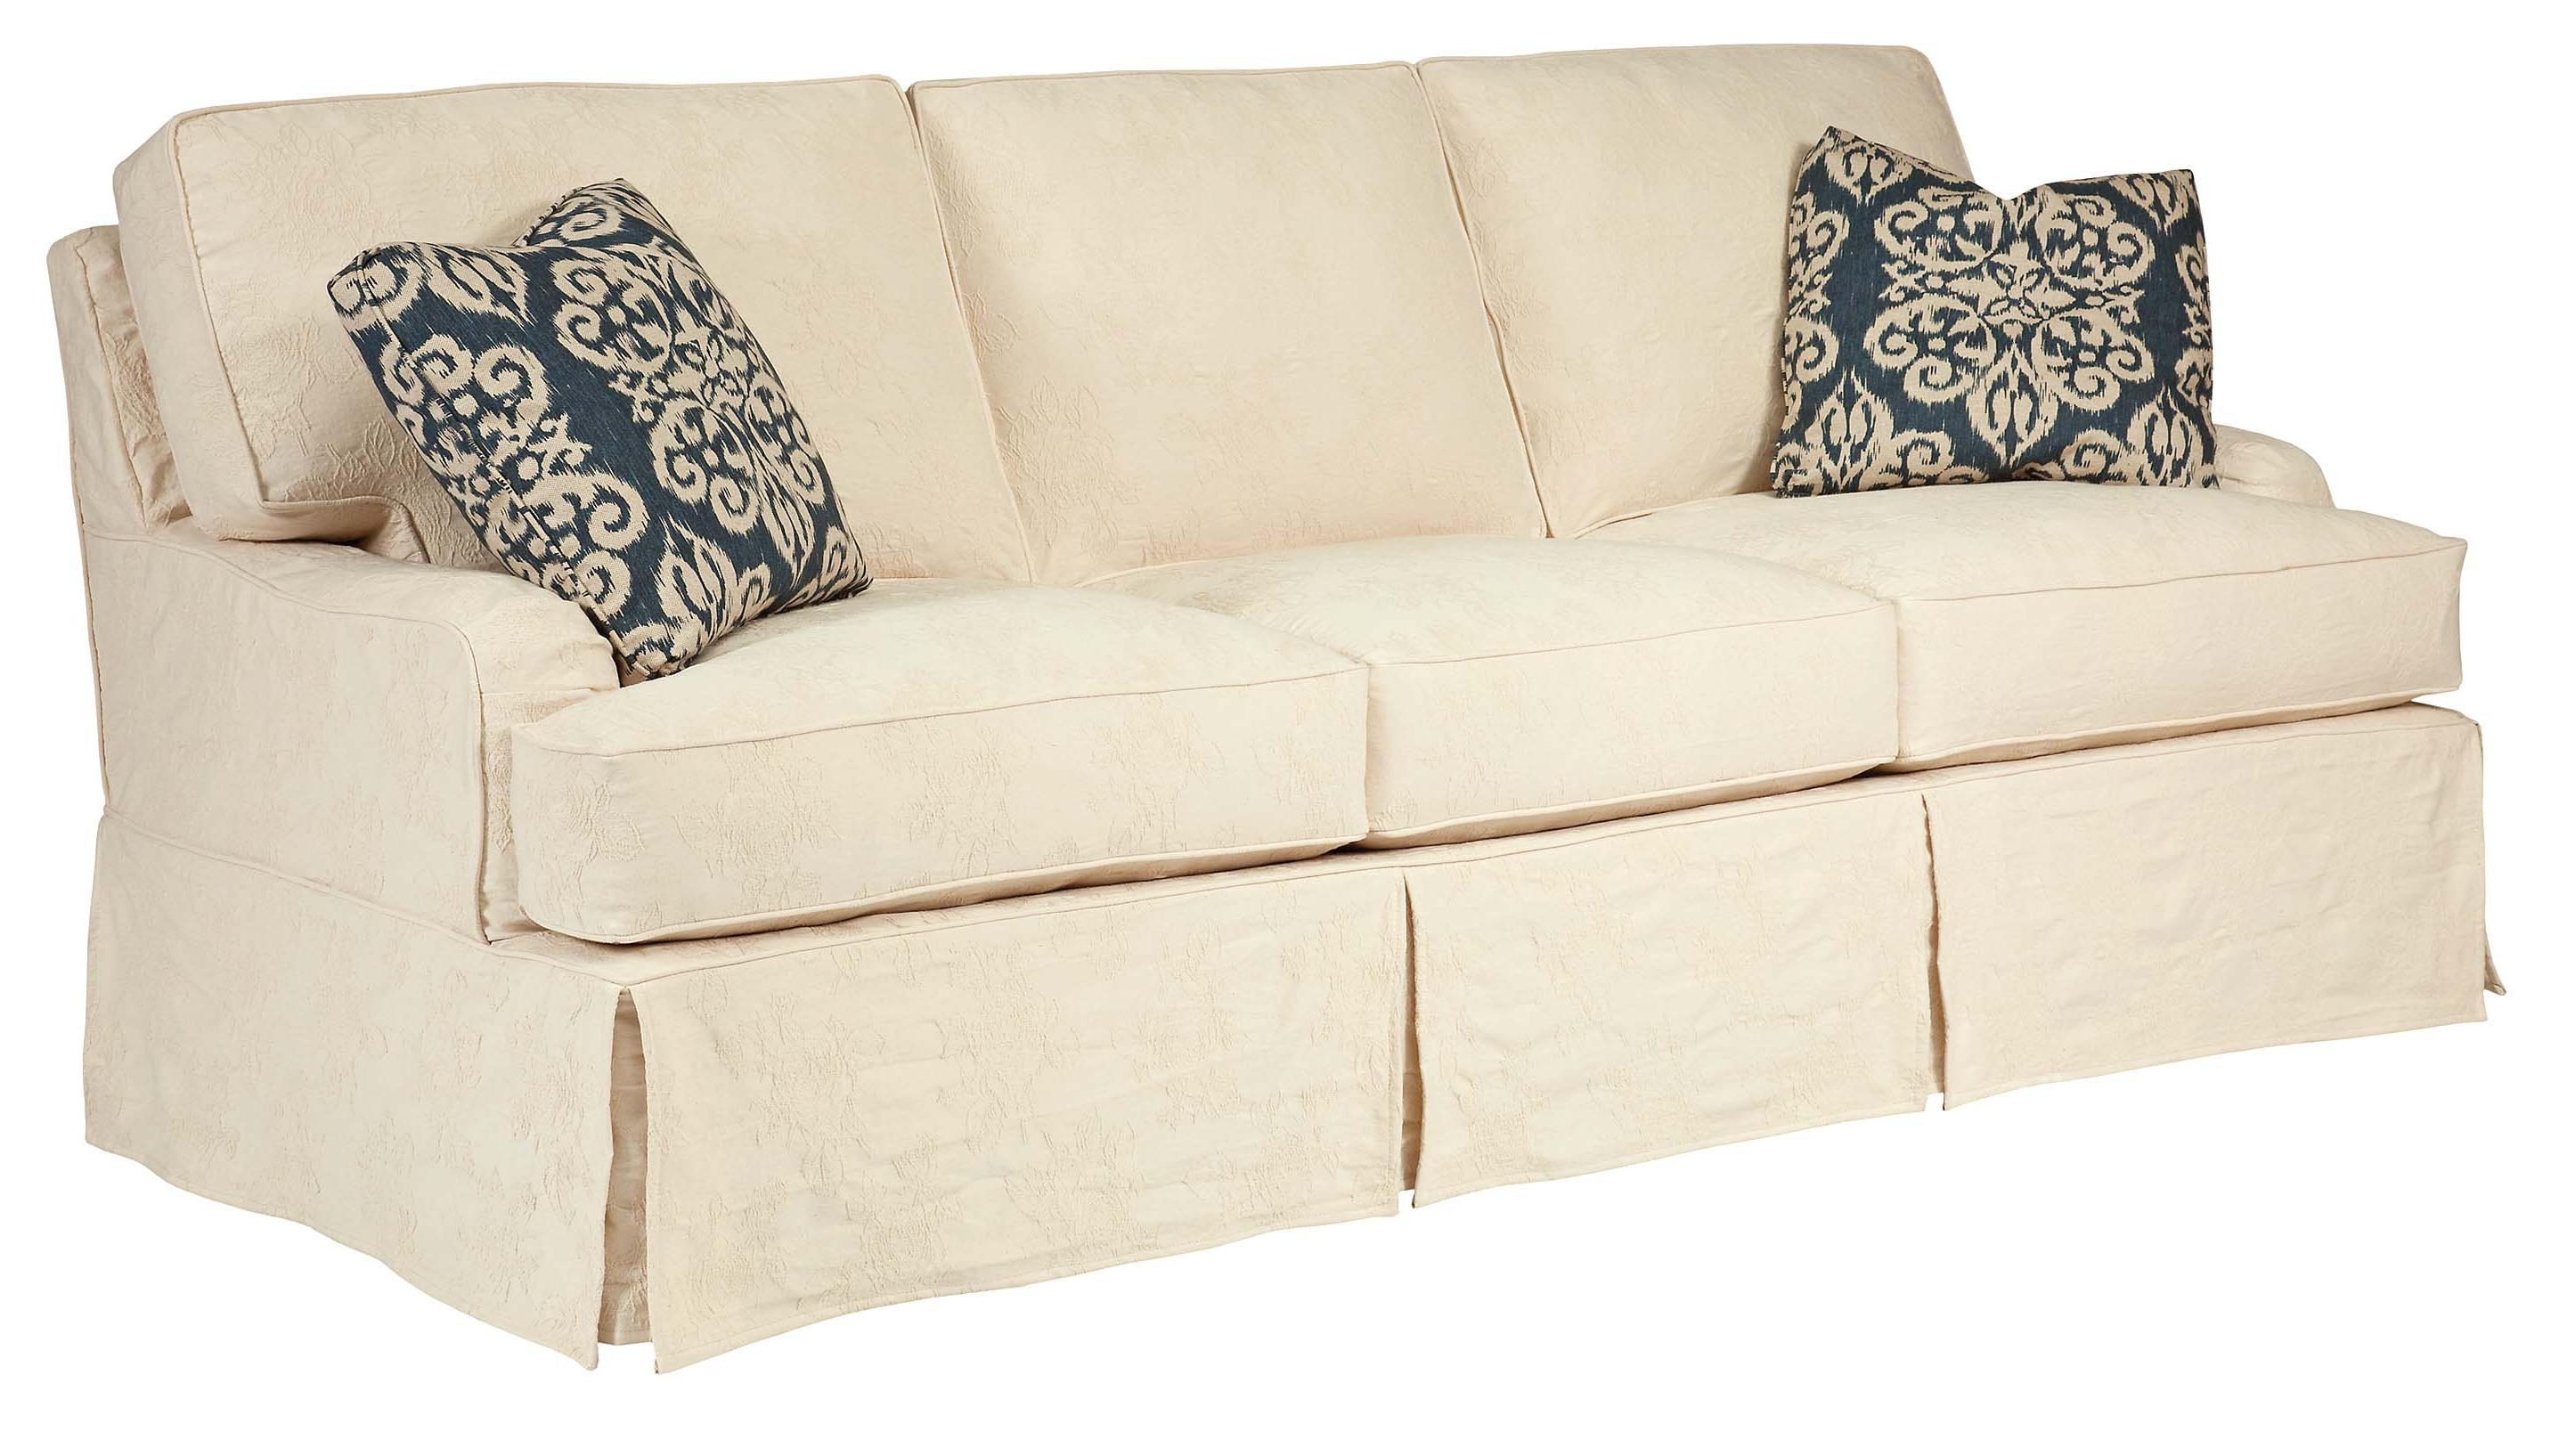 Kincaid Furniture Homecoming Simone Slipcover Sofa